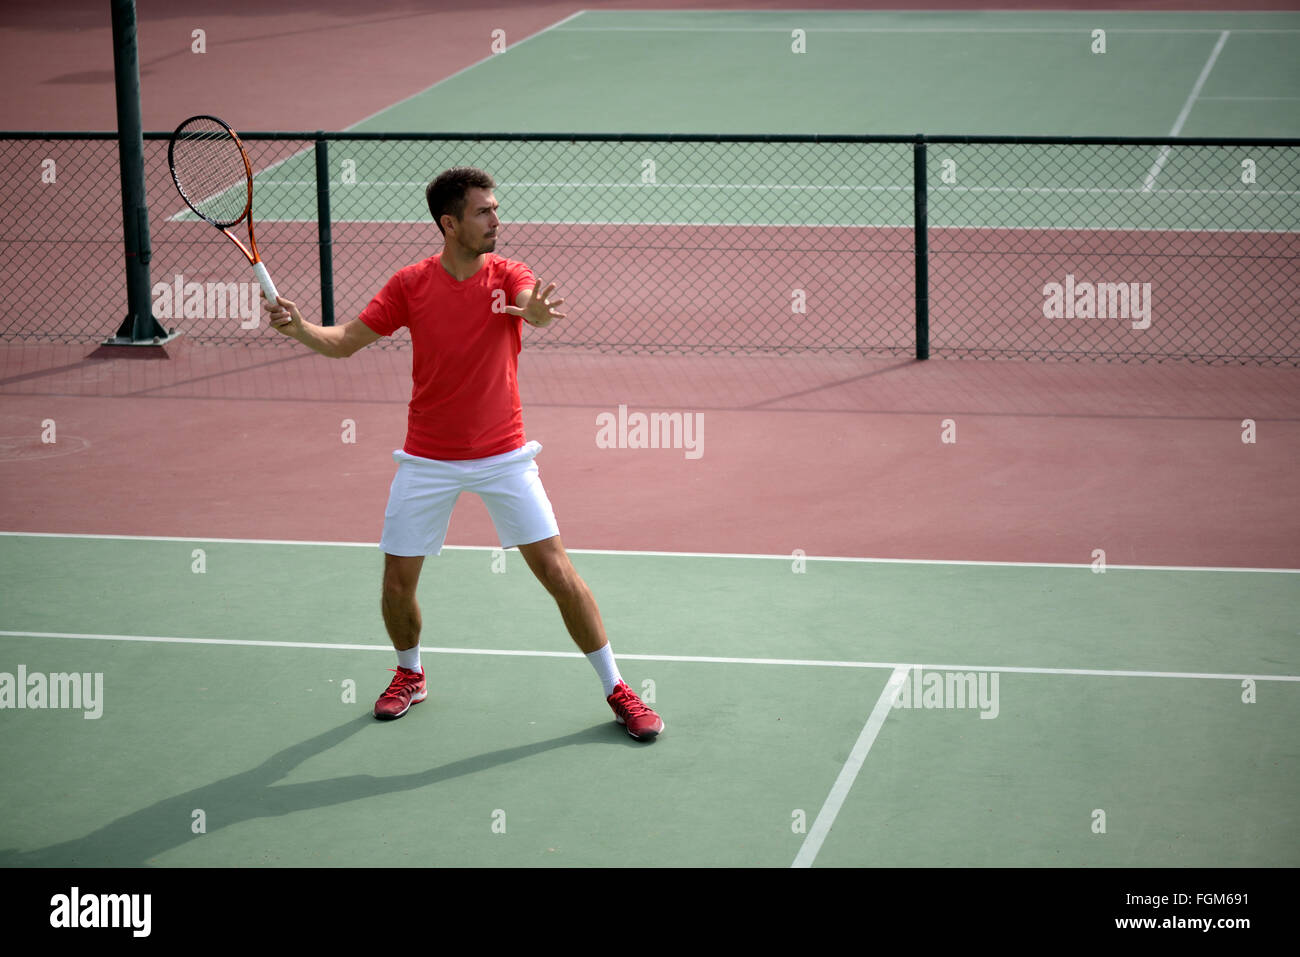 Jugador de tenis masculino práctica en cancha de tenis en Dubai. Imagen De Stock